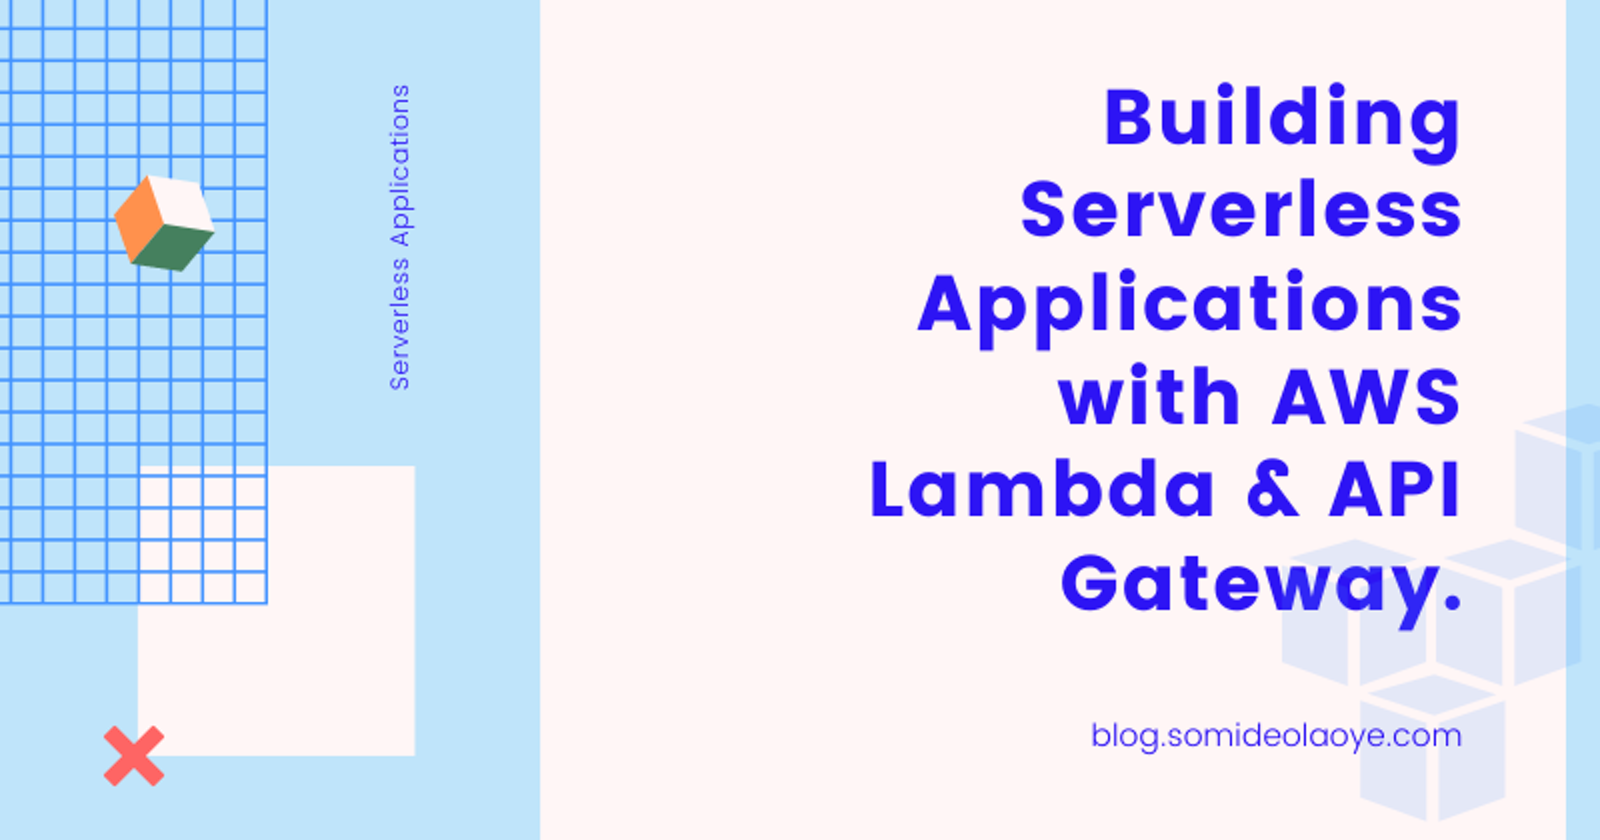 Building Serverless Applications with AWS Lambda & API Gateway.